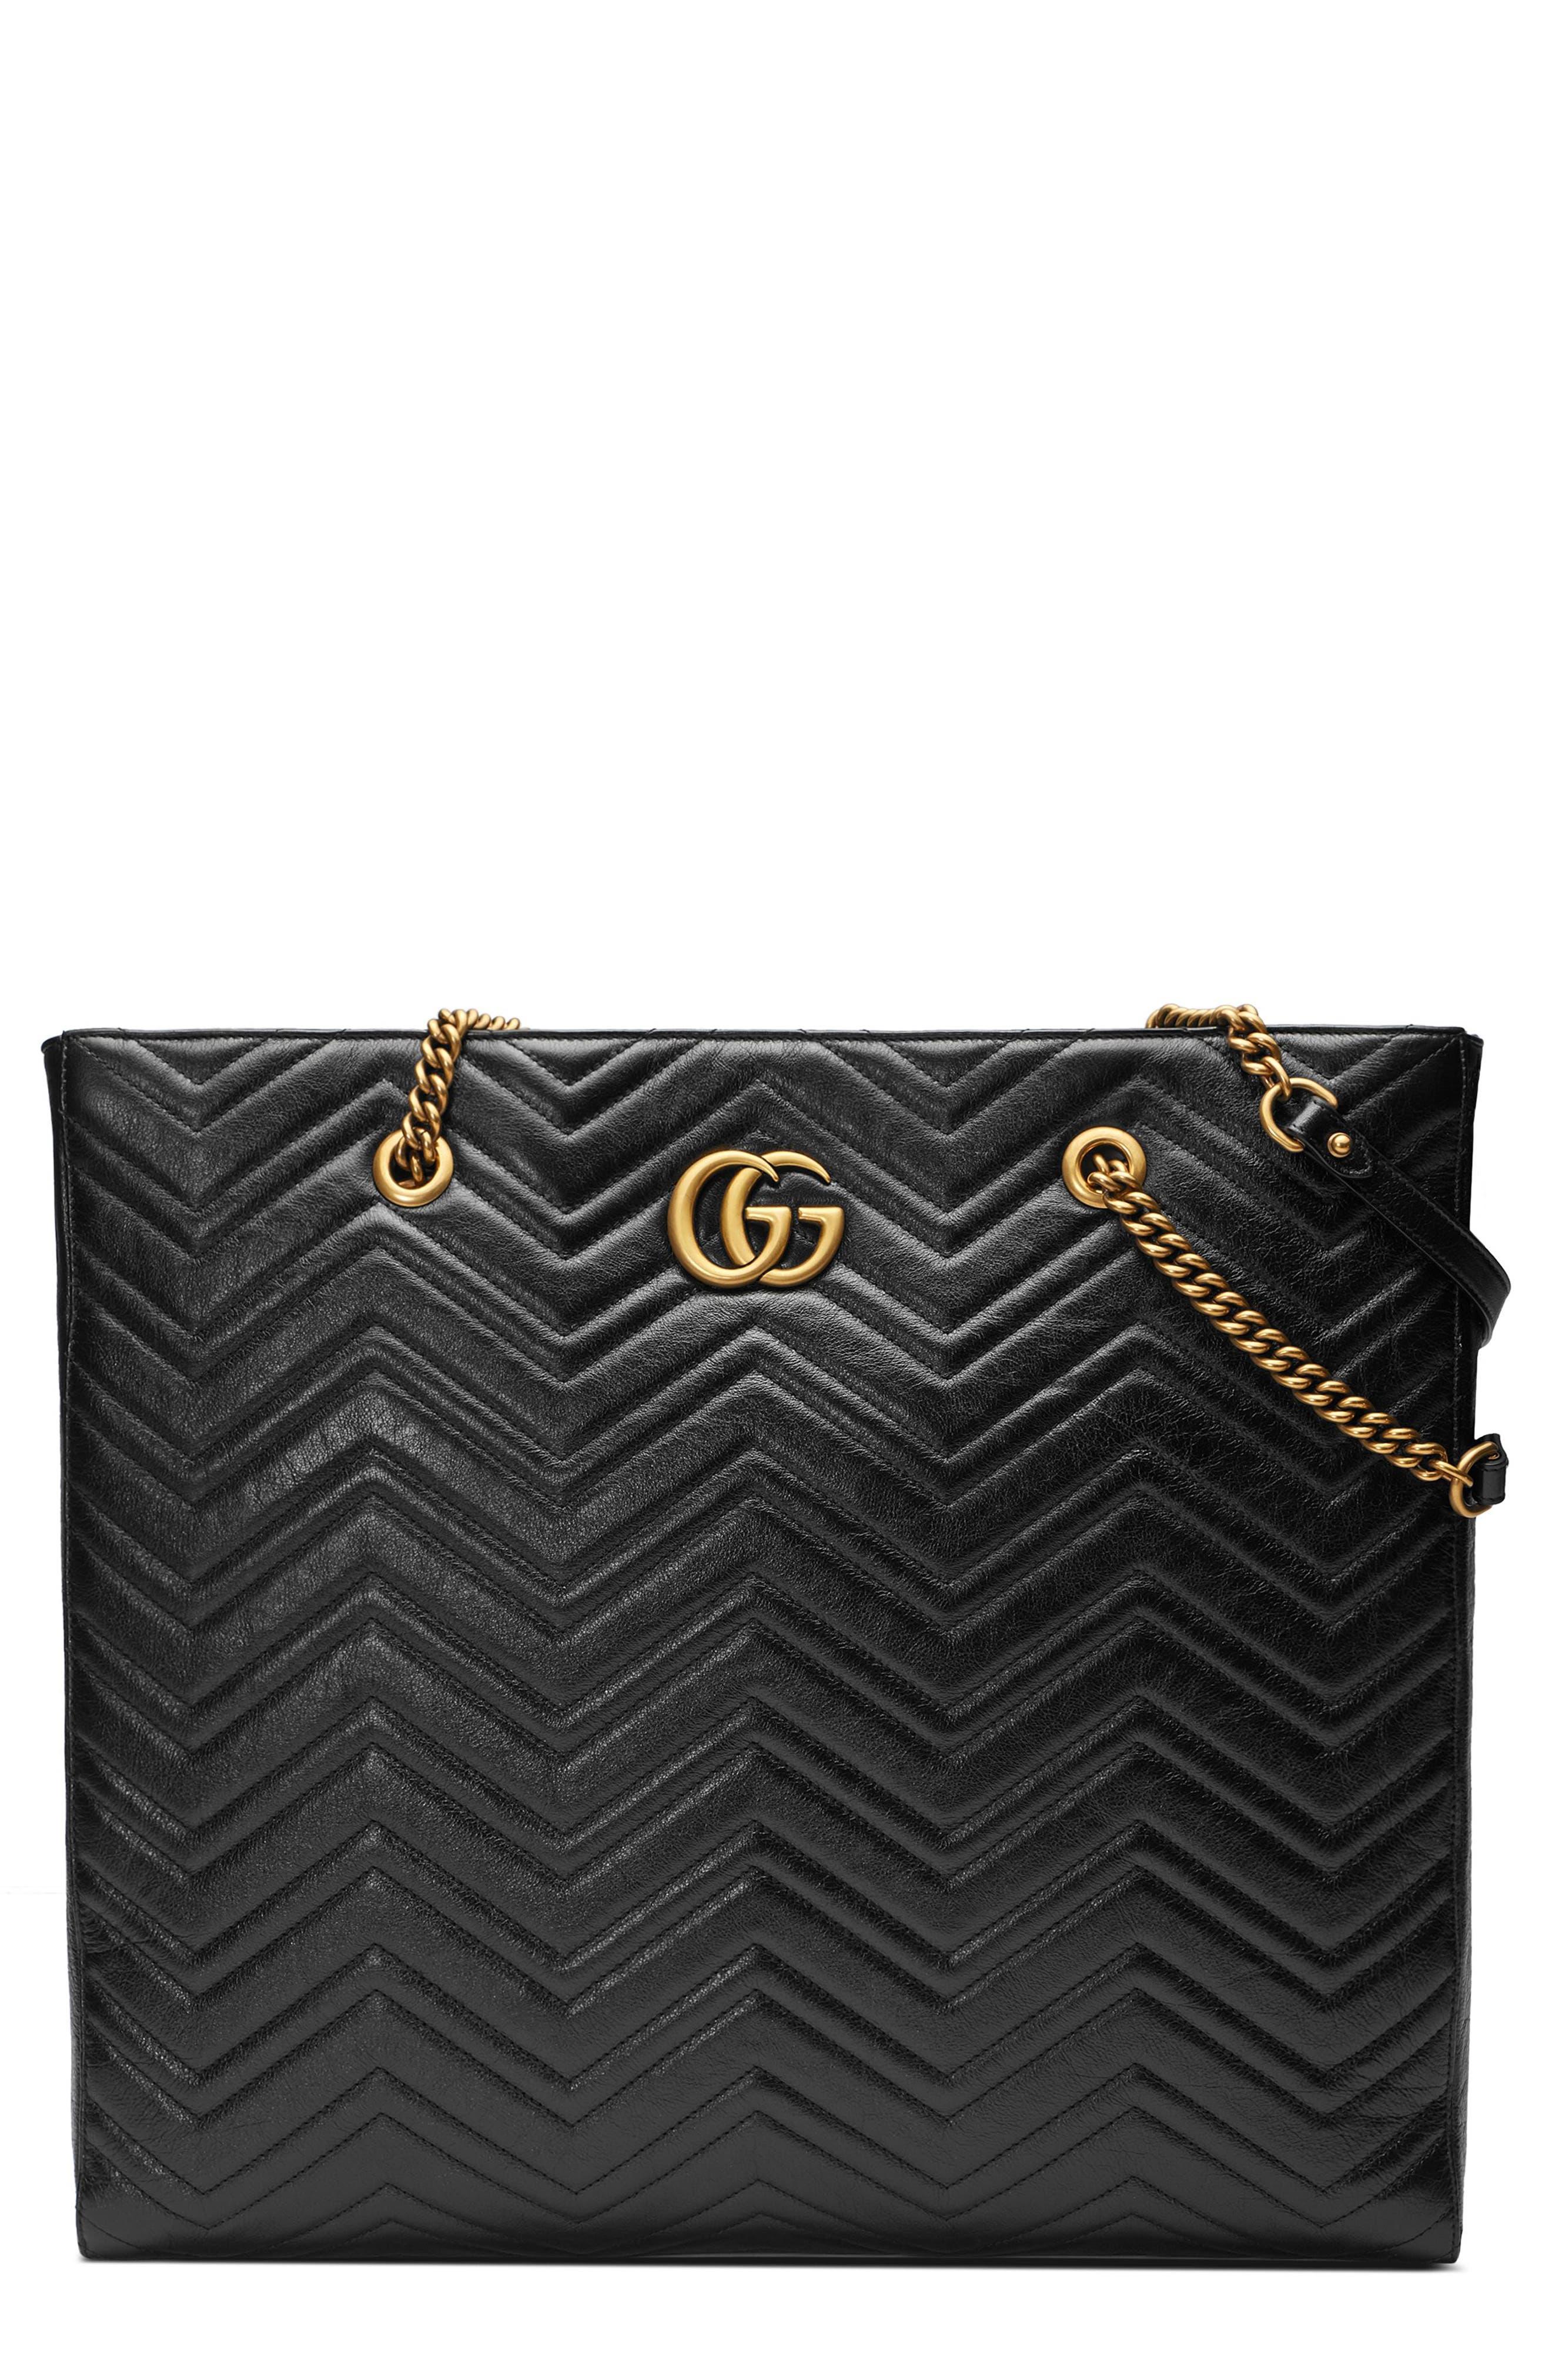 GG Marmont 2.0 Matelassé Leather North/South Tote Bag,                             Main thumbnail 1, color,                             NERO/ NERO